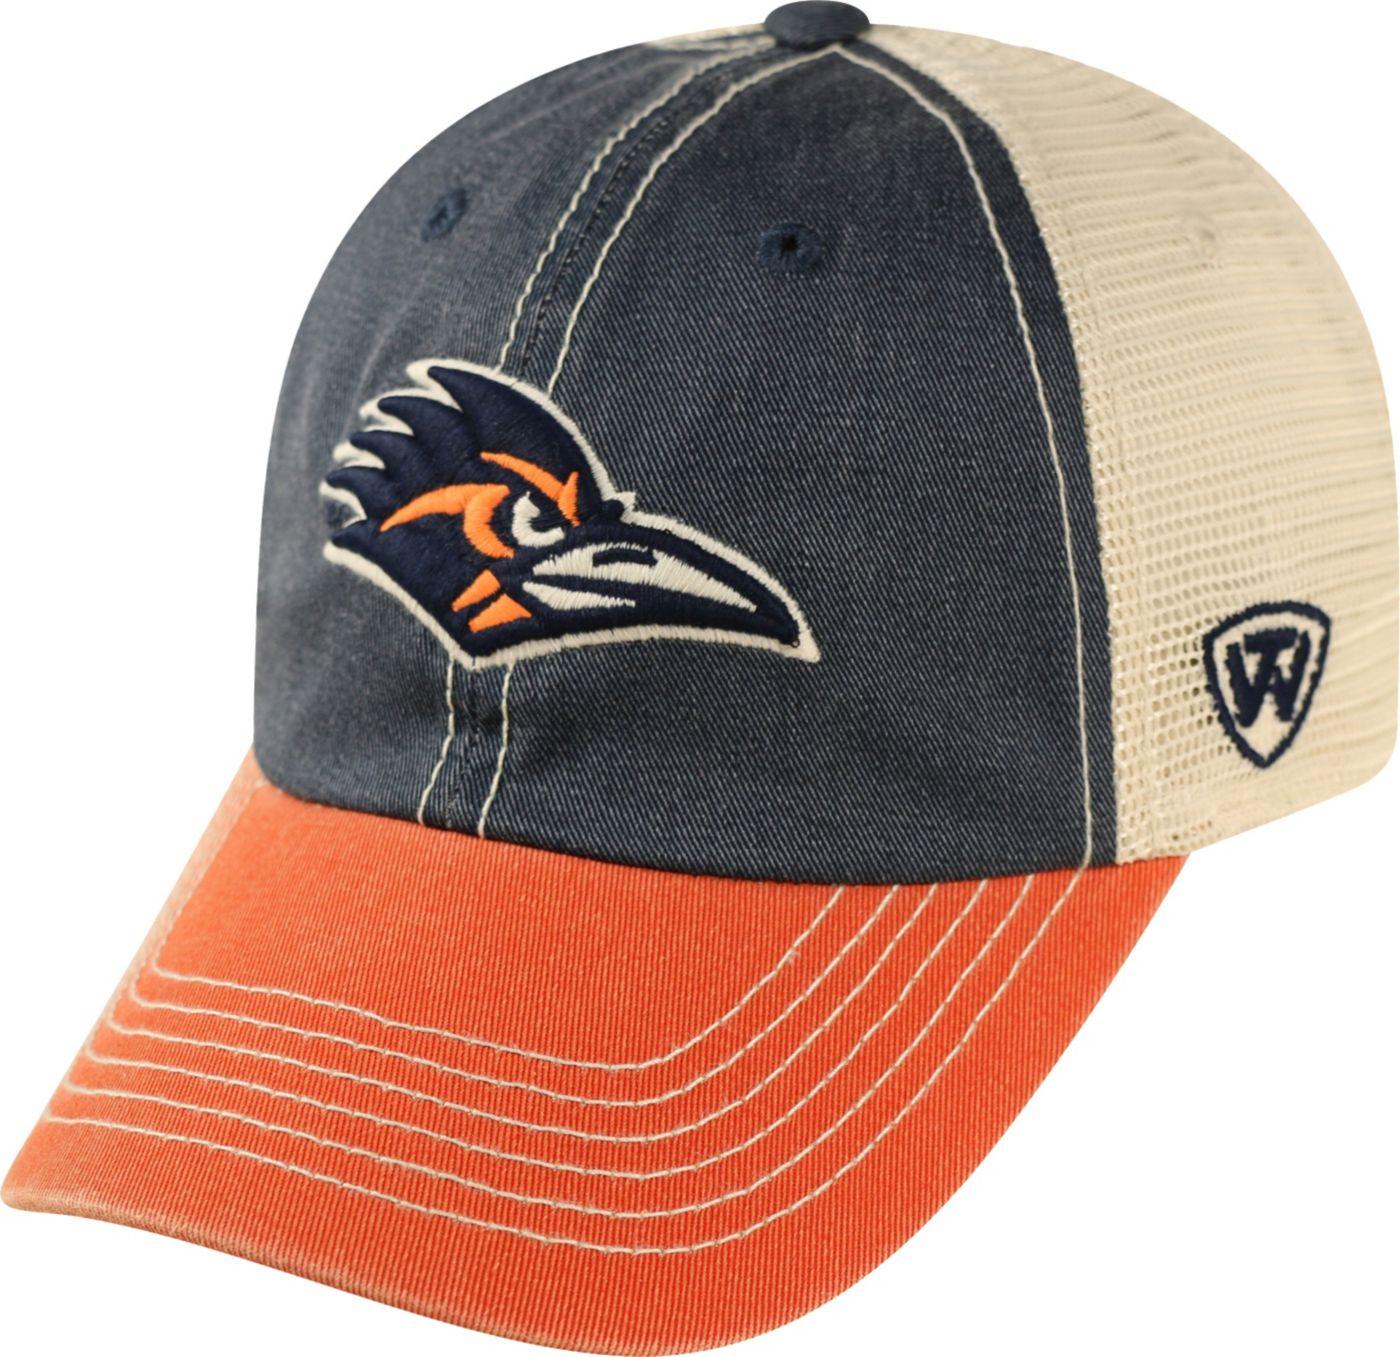 Top of the World Men's UT San Antonio Roadrunners Blue/White/Orange Off Road Adjustable Hat